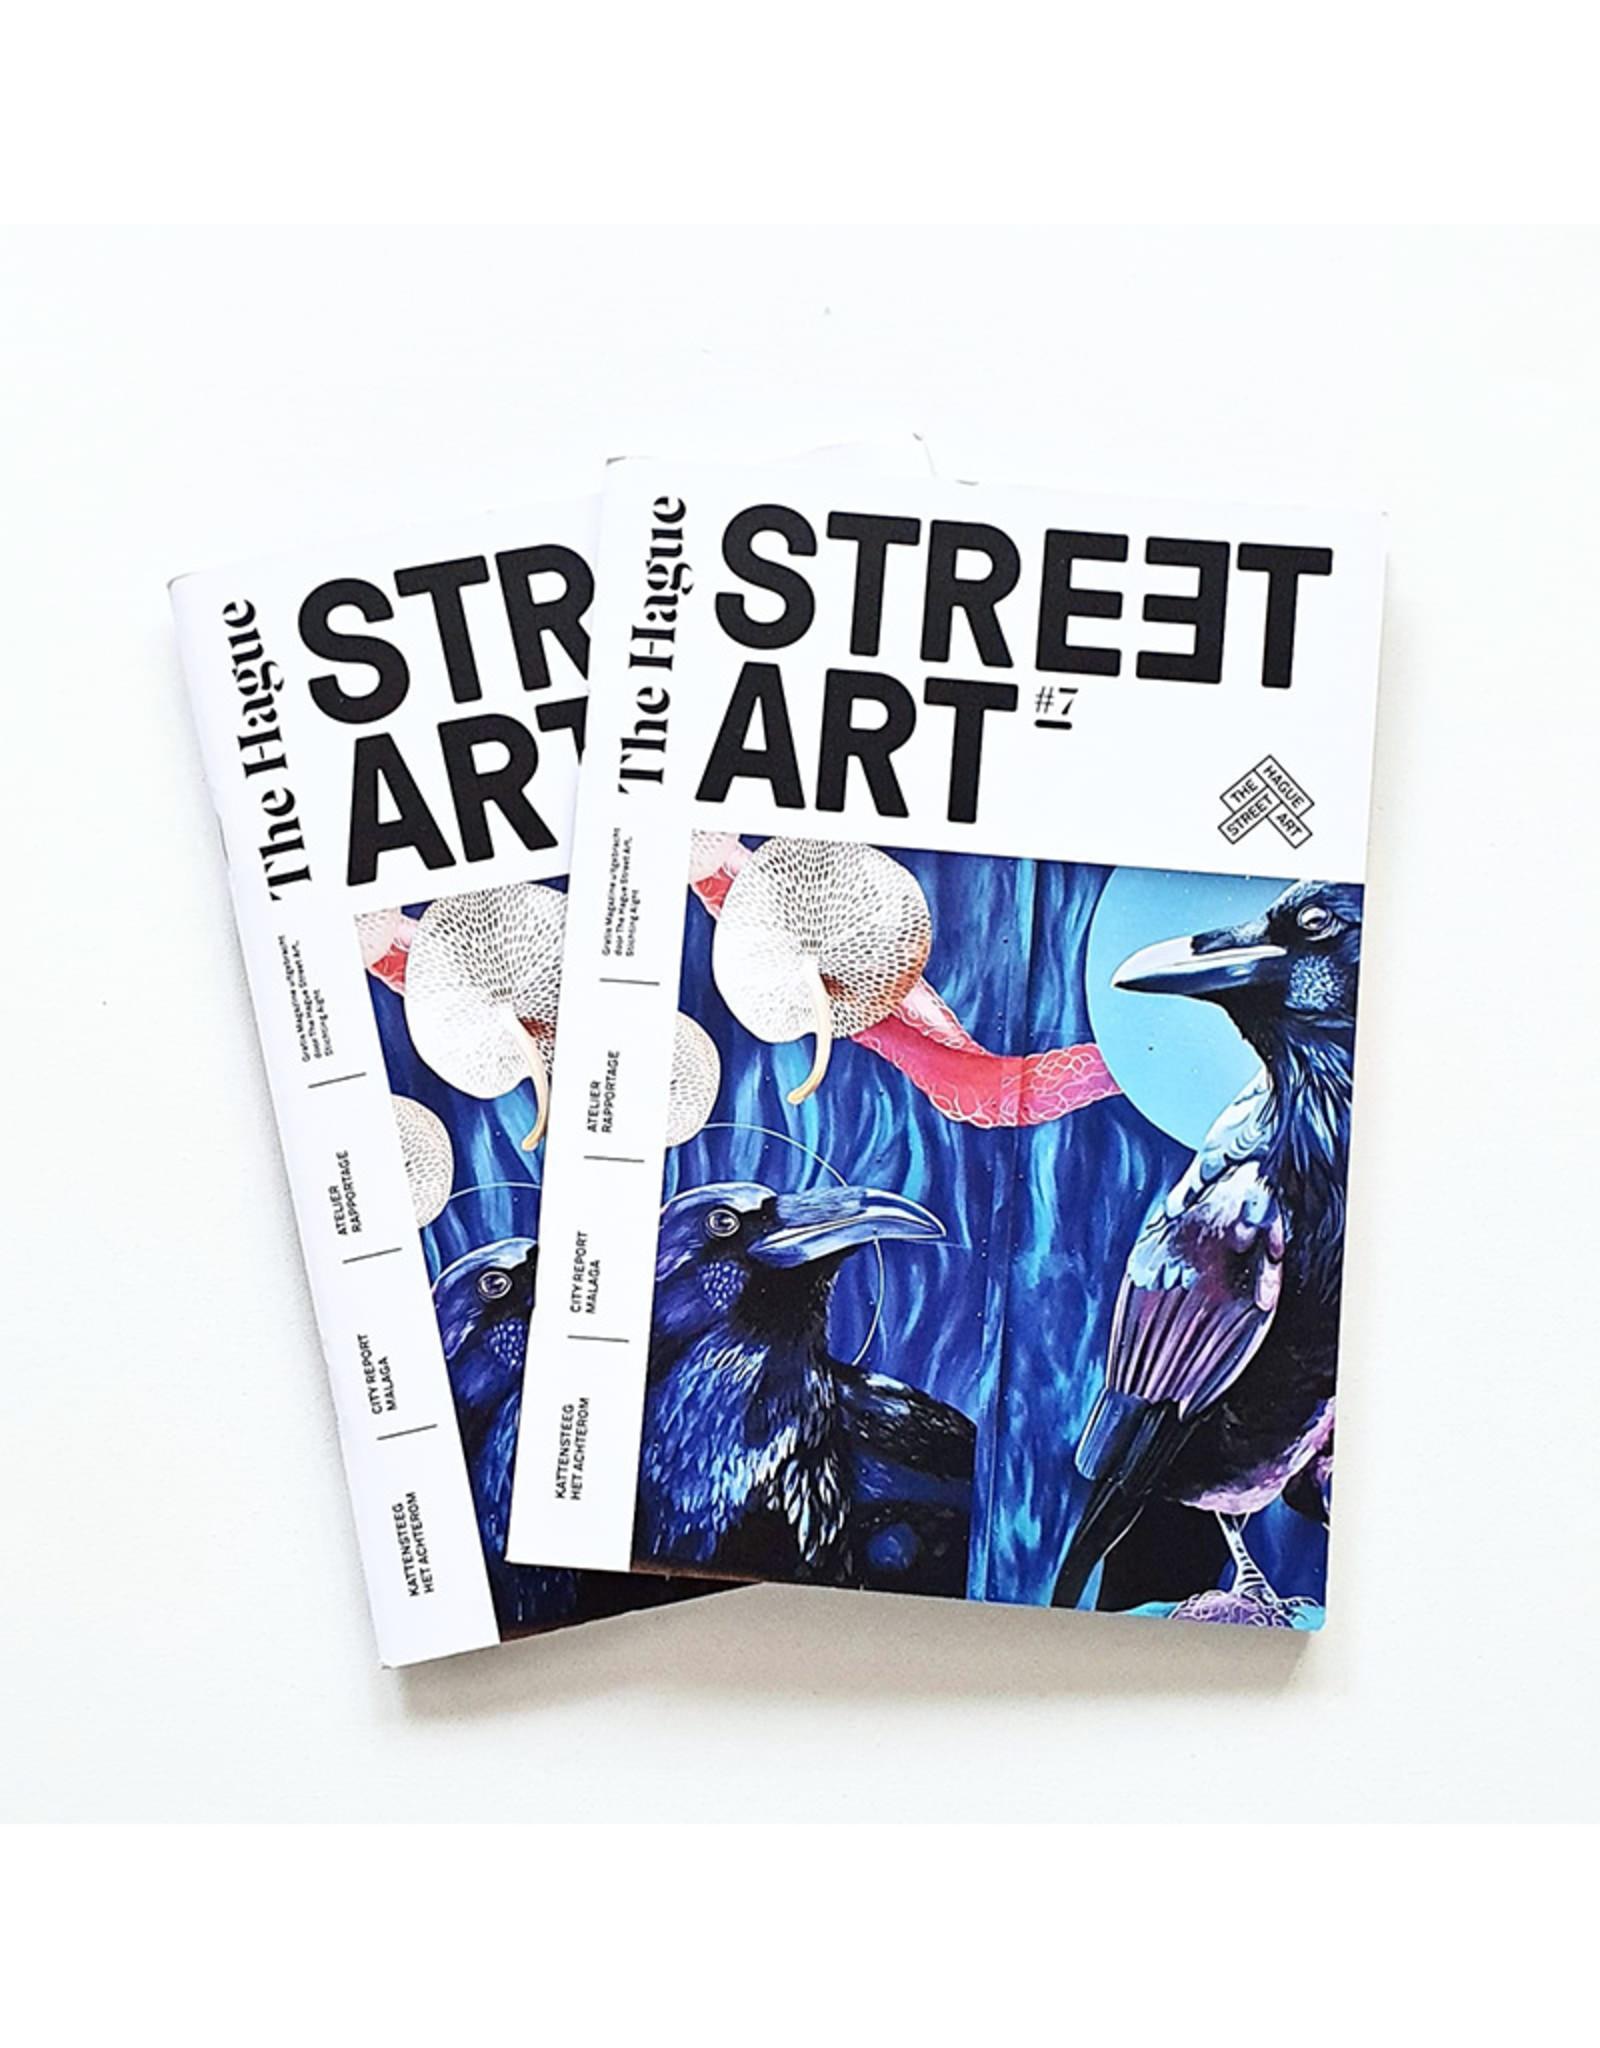 The Hague Street-art The Hague Street-art Magazine #7